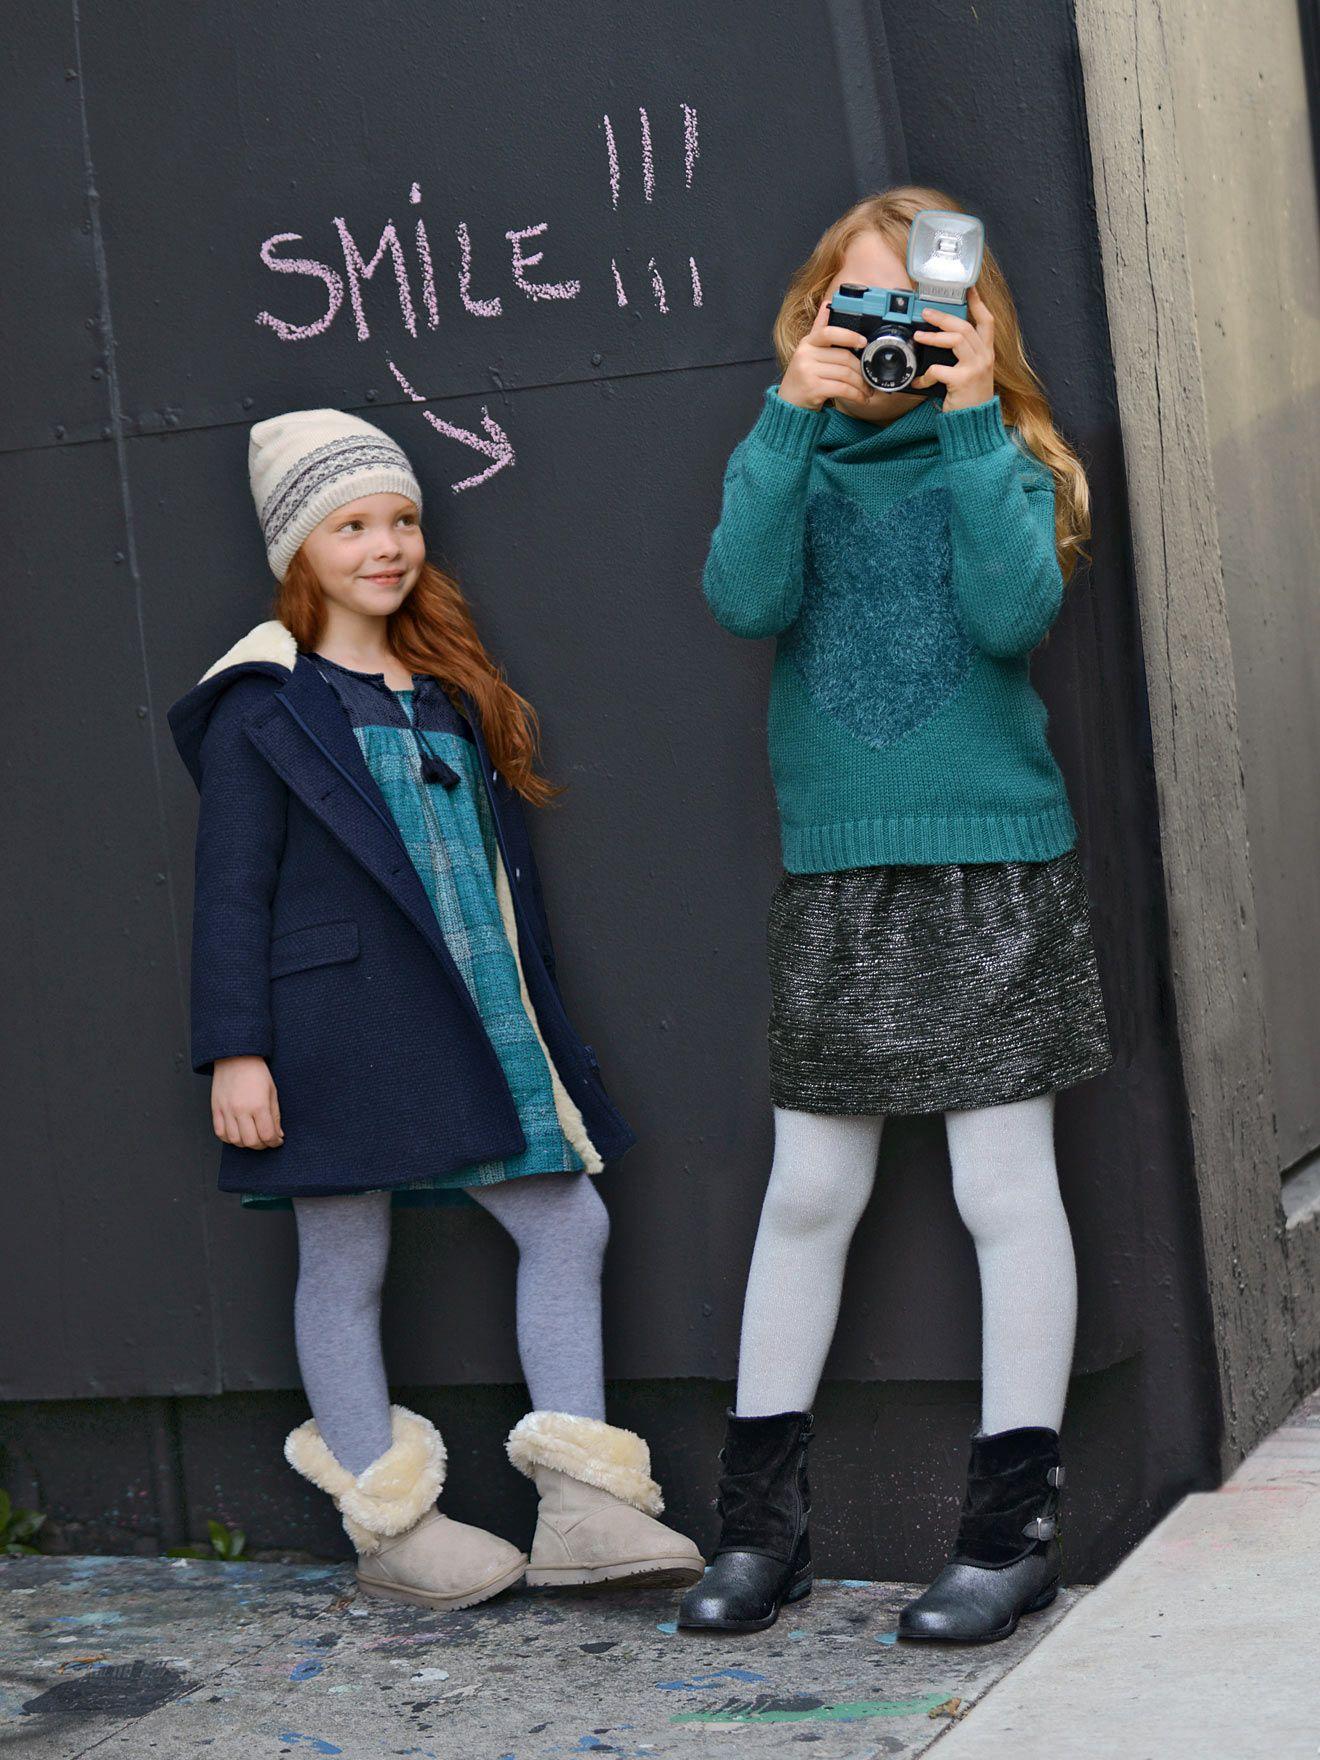 vertbaudet tweedrock f r m dchen in dunkelblau bedruckt fw 16 17 kids trends dunkelblau. Black Bedroom Furniture Sets. Home Design Ideas